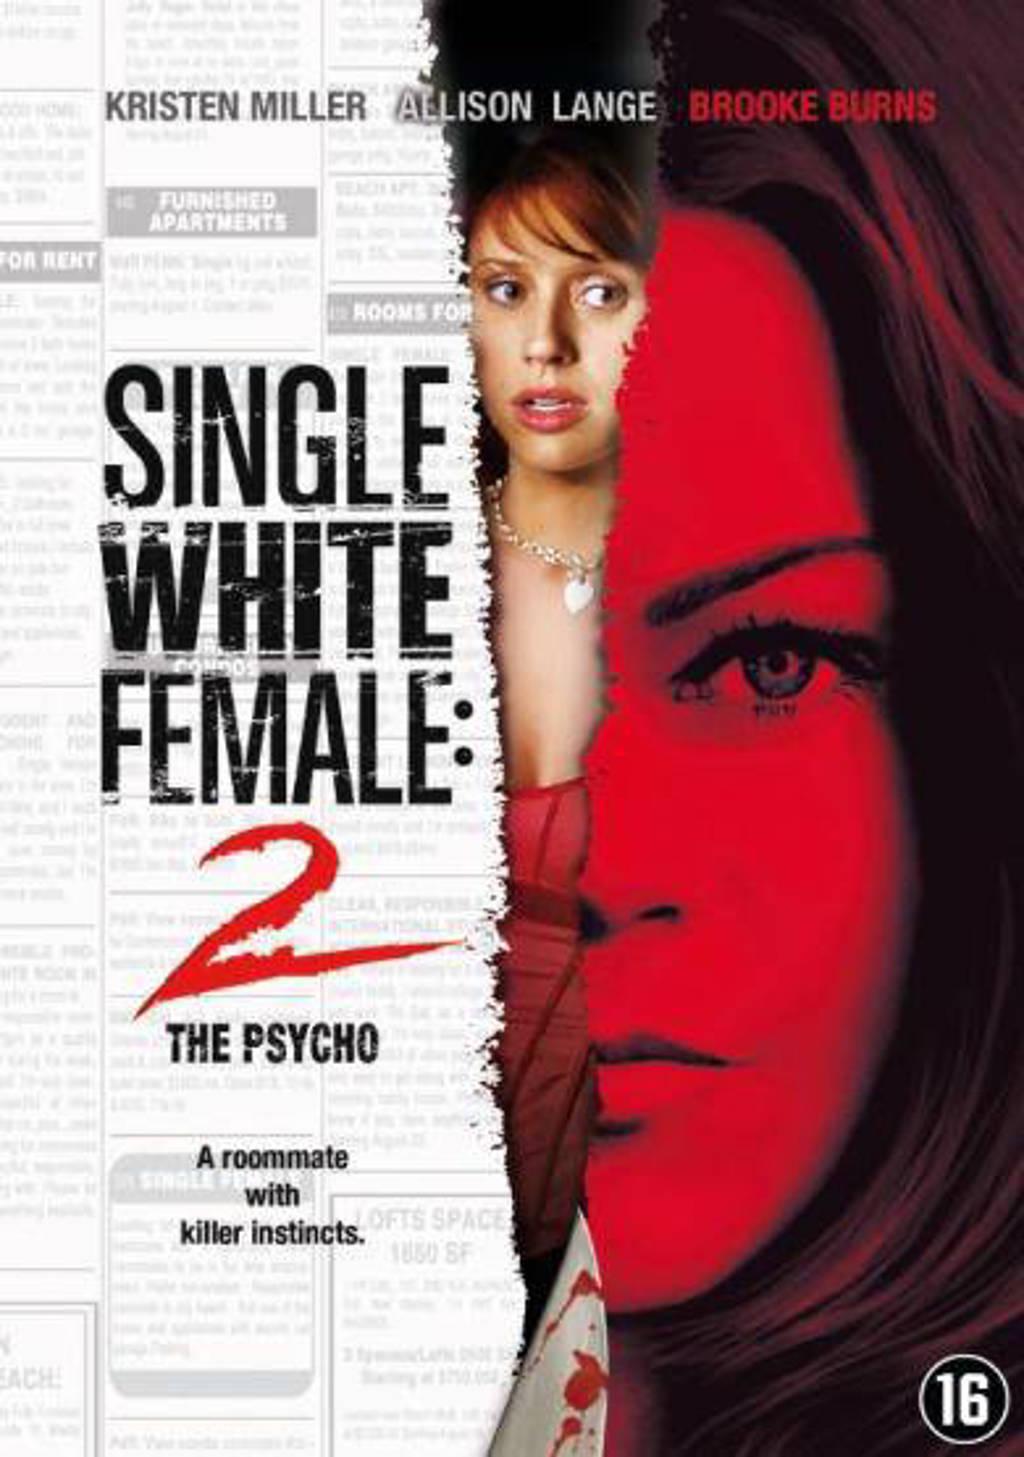 Single white female 2 - The psycho (DVD)